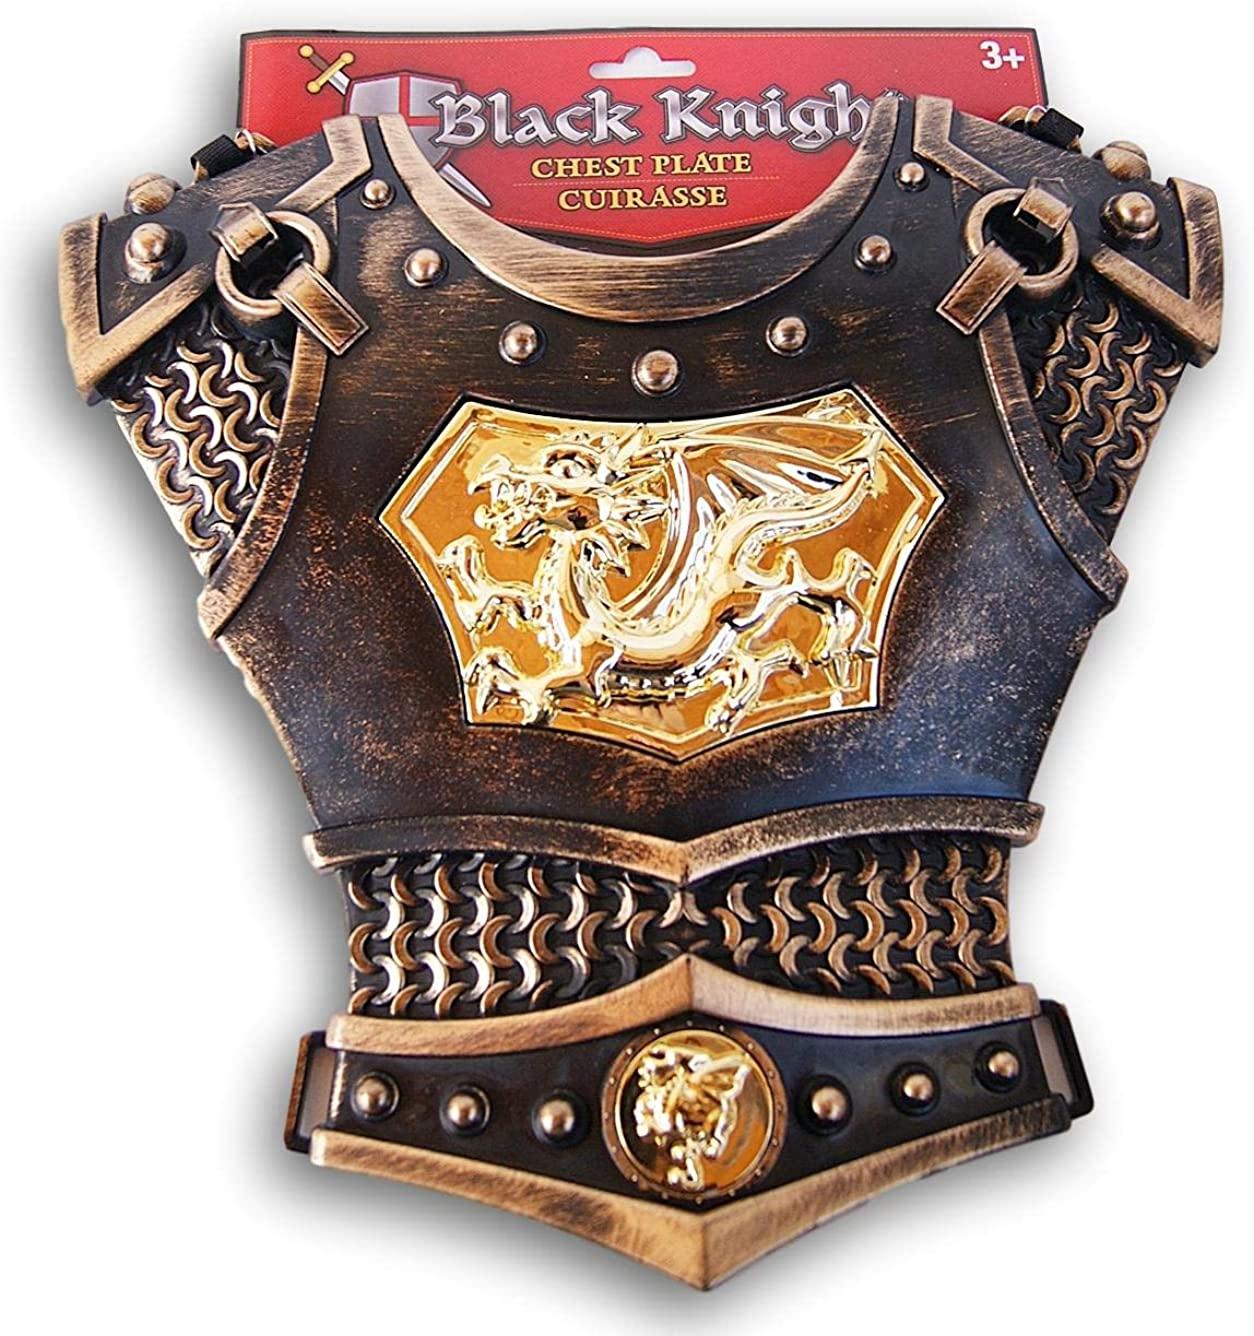 Black Knight Gold Dragon Cuirasse Chest Plate Armor for Children's Costume